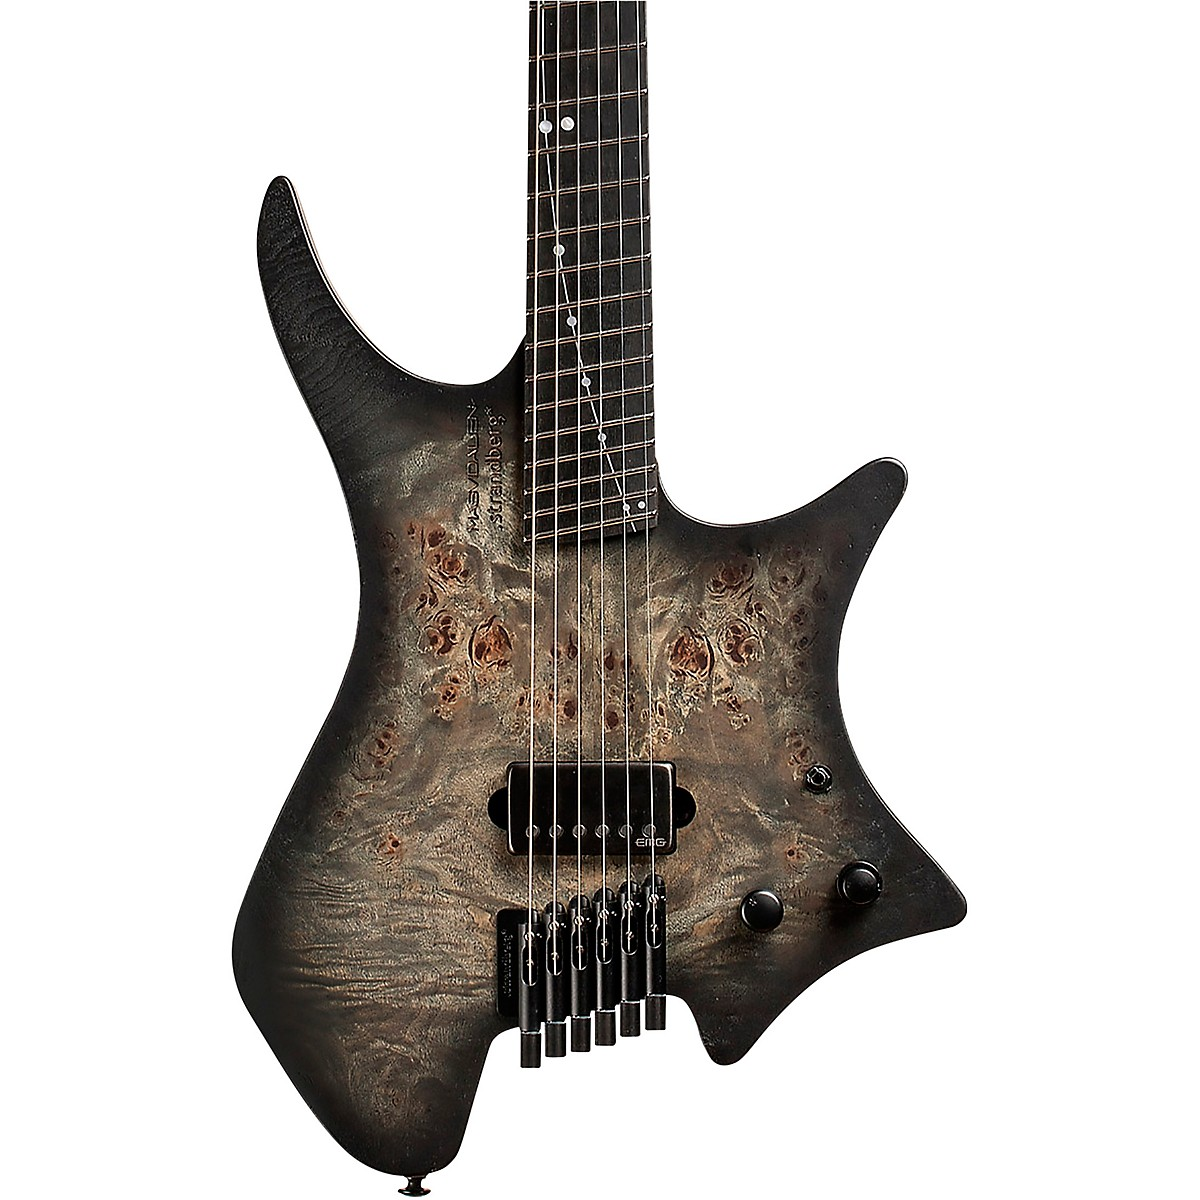 Strandberg Boden Masvidalien Cosmo Edition Electric Guitar